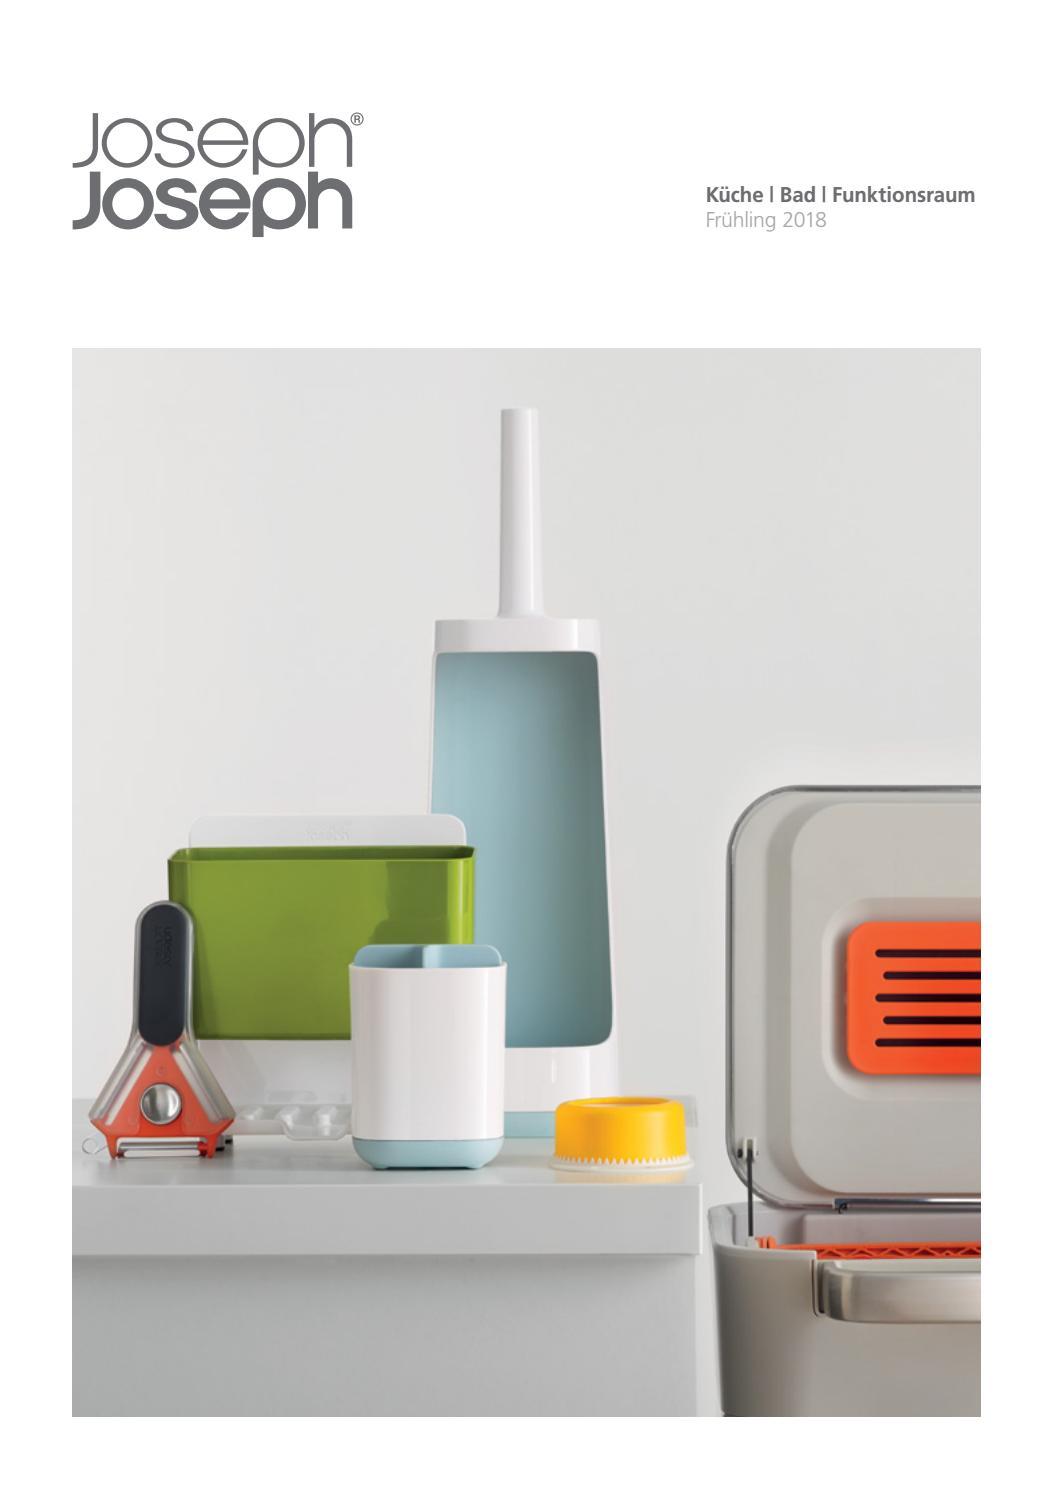 Joseph Joseph SS18 Catalogue - German by Joseph Joseph - issuu